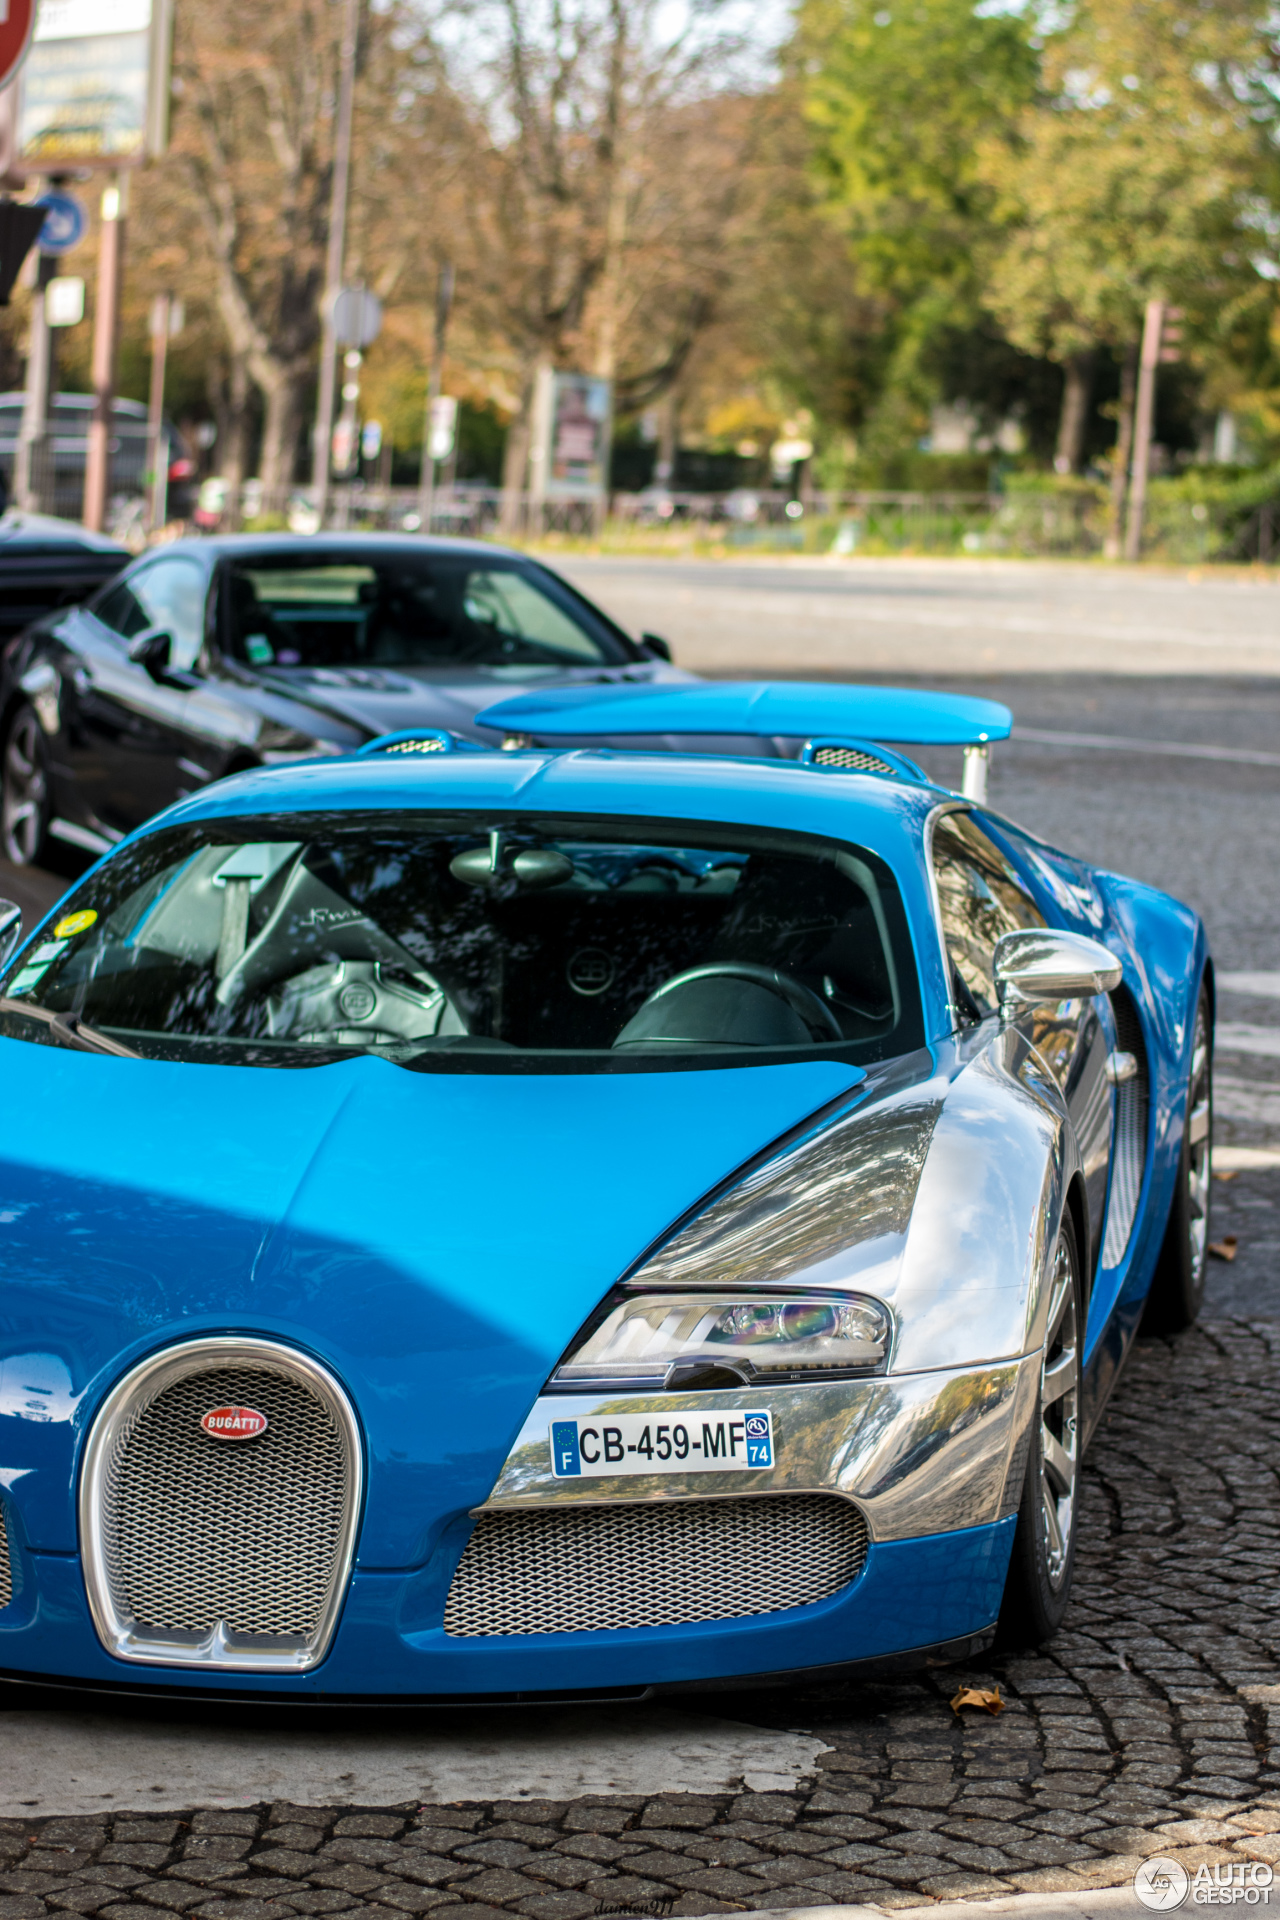 bugatti-veyron-164-centenaire-c987229102017011654_8 Stunning Bugatti Veyron Price In Brazil Cars Trend